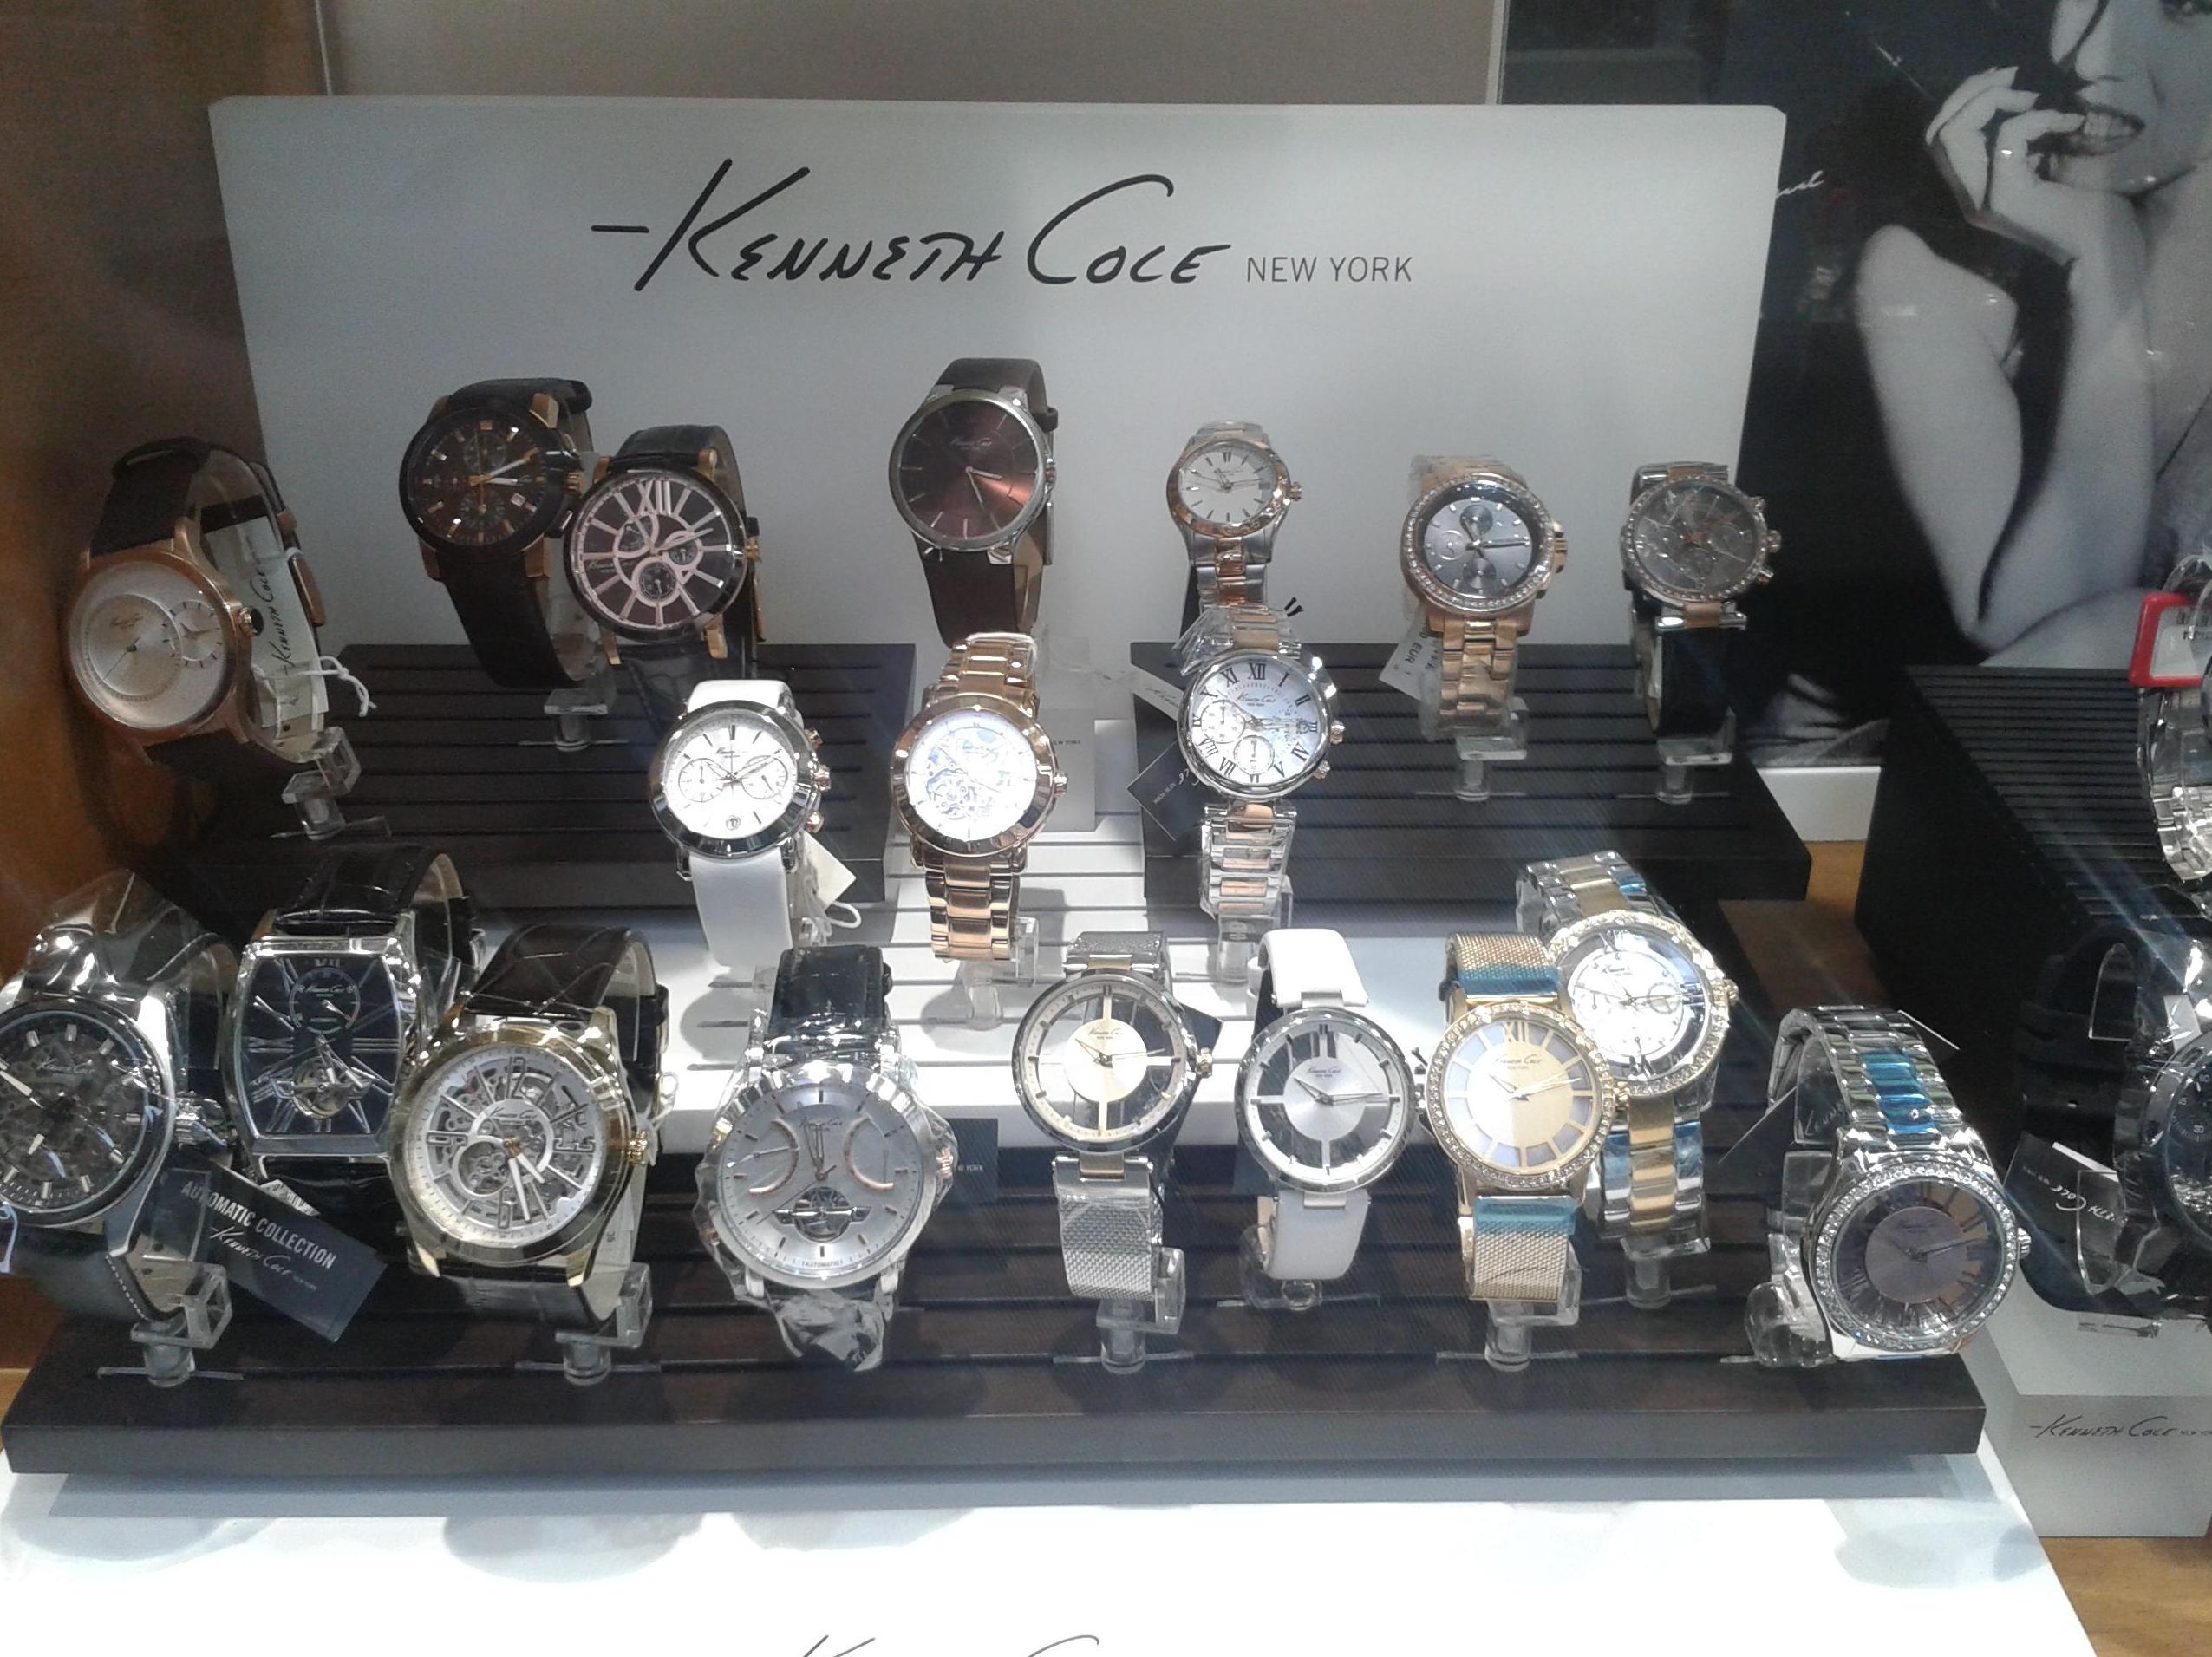 Relojes Kenneth Cole: Catalogo de Joyería Yoli